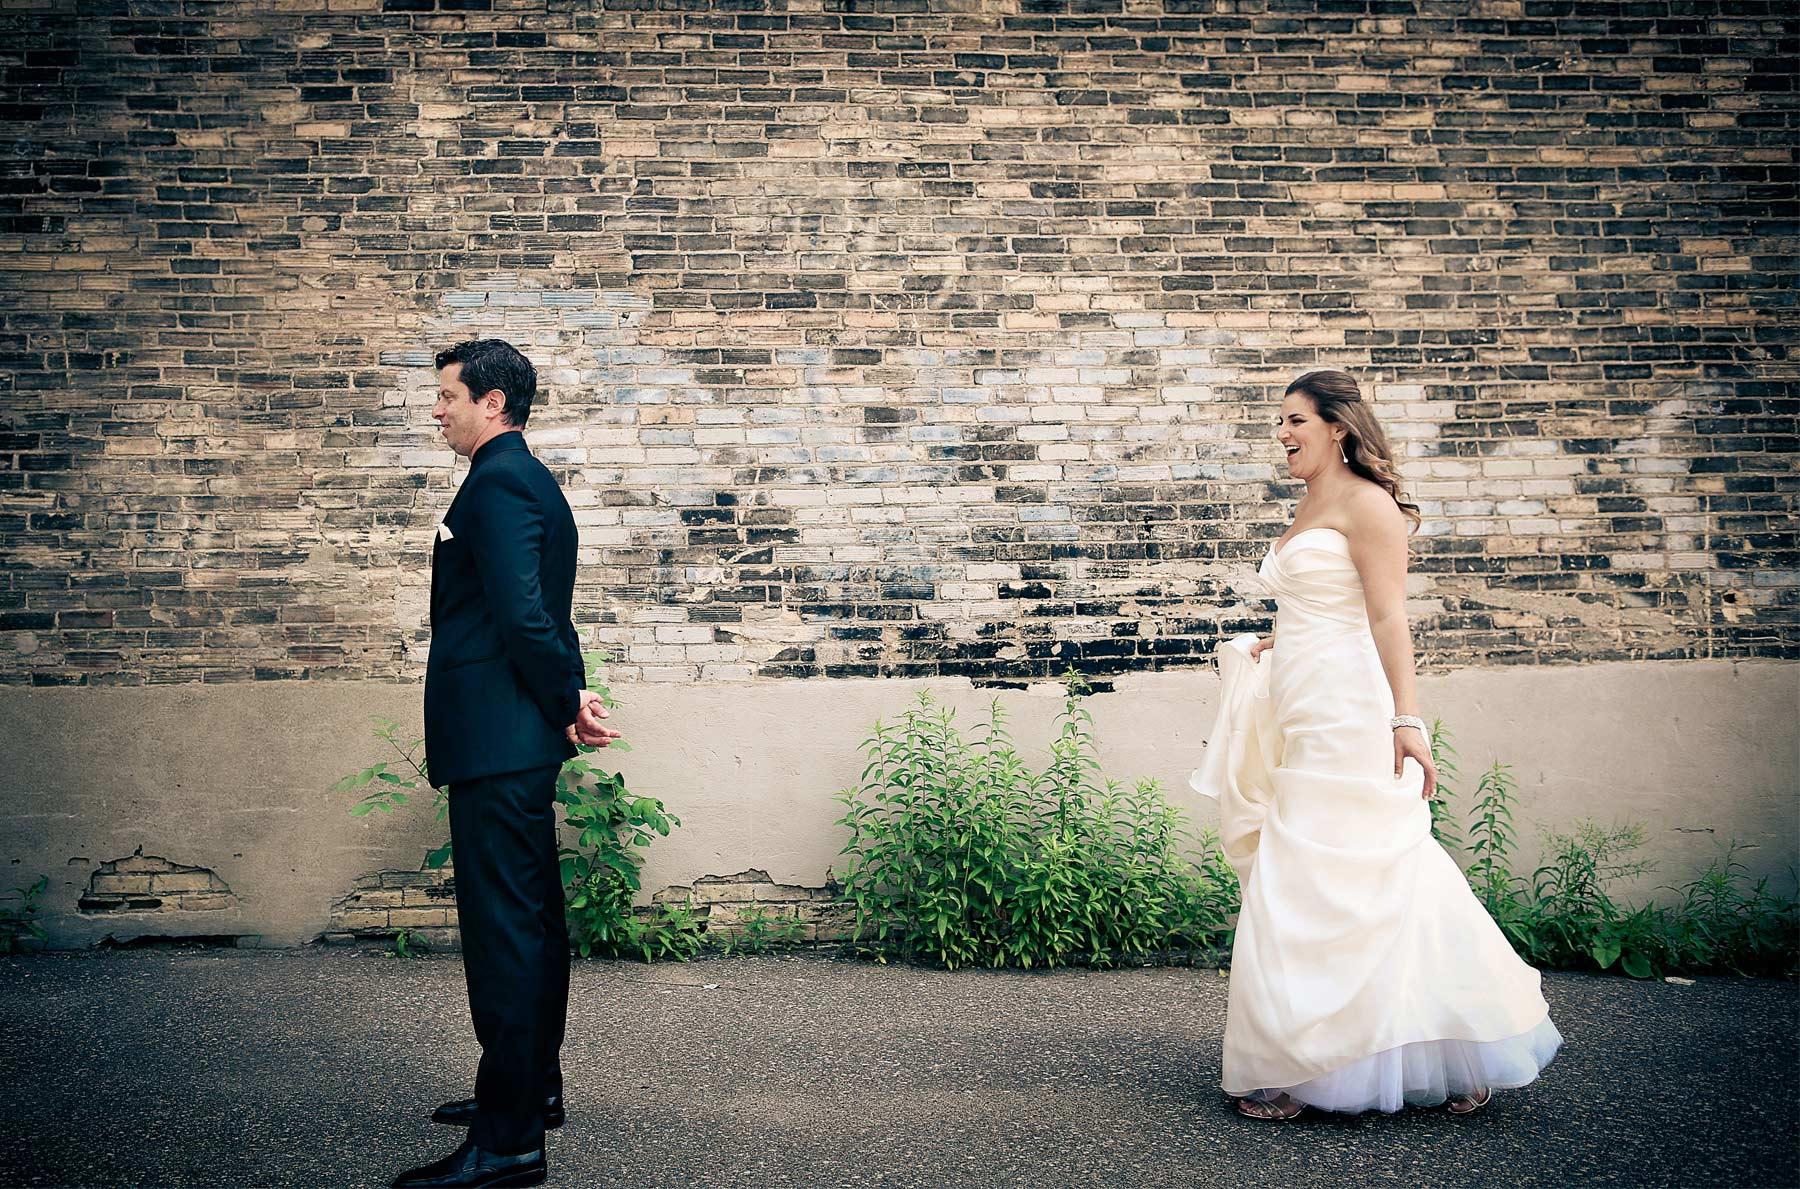 01-Minneapolis-Minnesota-Wedding-Photography-by-Vick-Photography-Aria-Downtown-First-Look-Layne-&-Dan.jpg